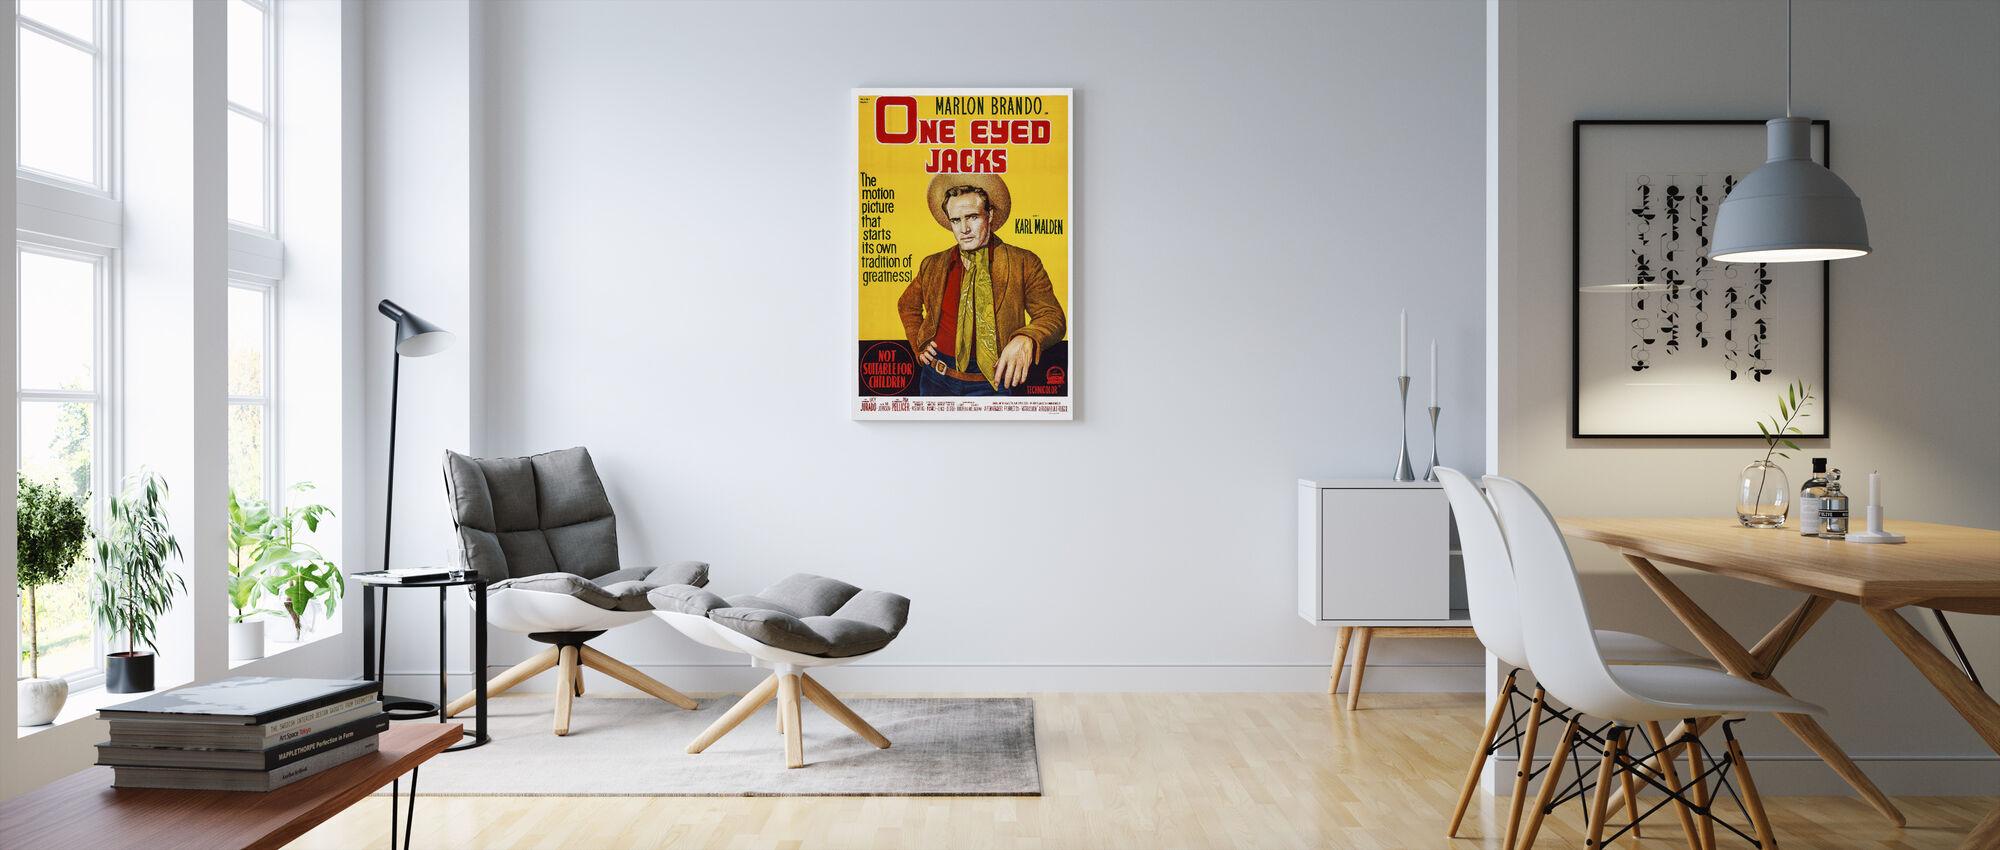 movie poster one eyed jacks impression sur toile de grande qualit photowall. Black Bedroom Furniture Sets. Home Design Ideas